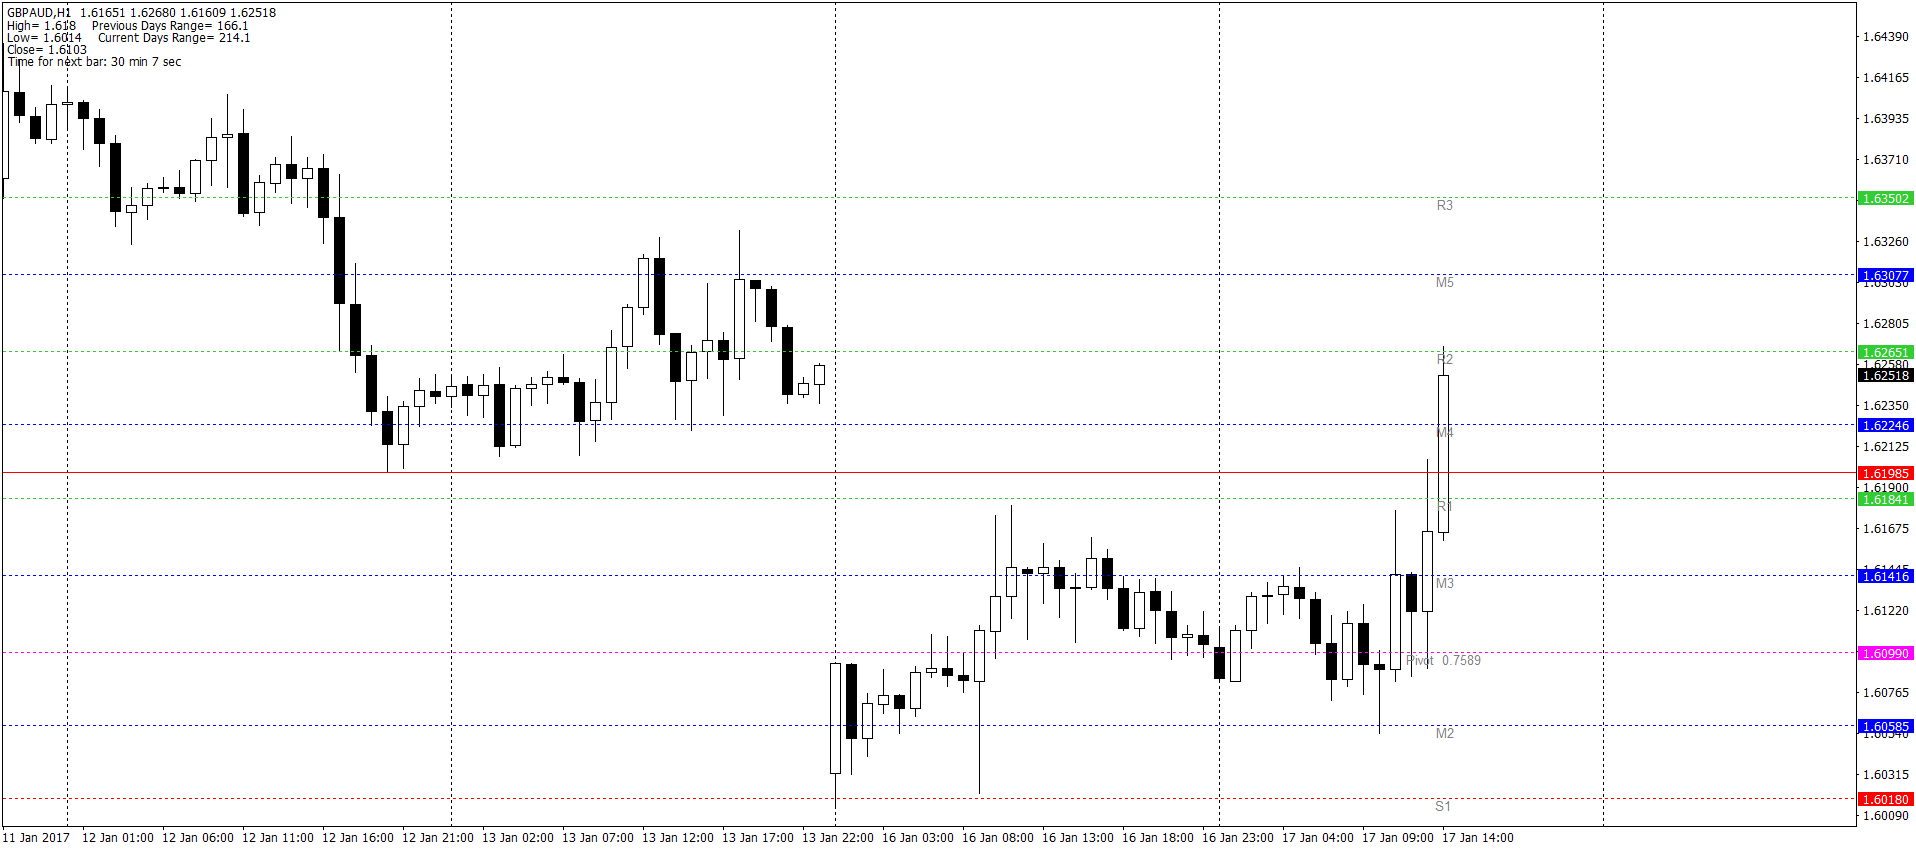 GBP/AUD H1